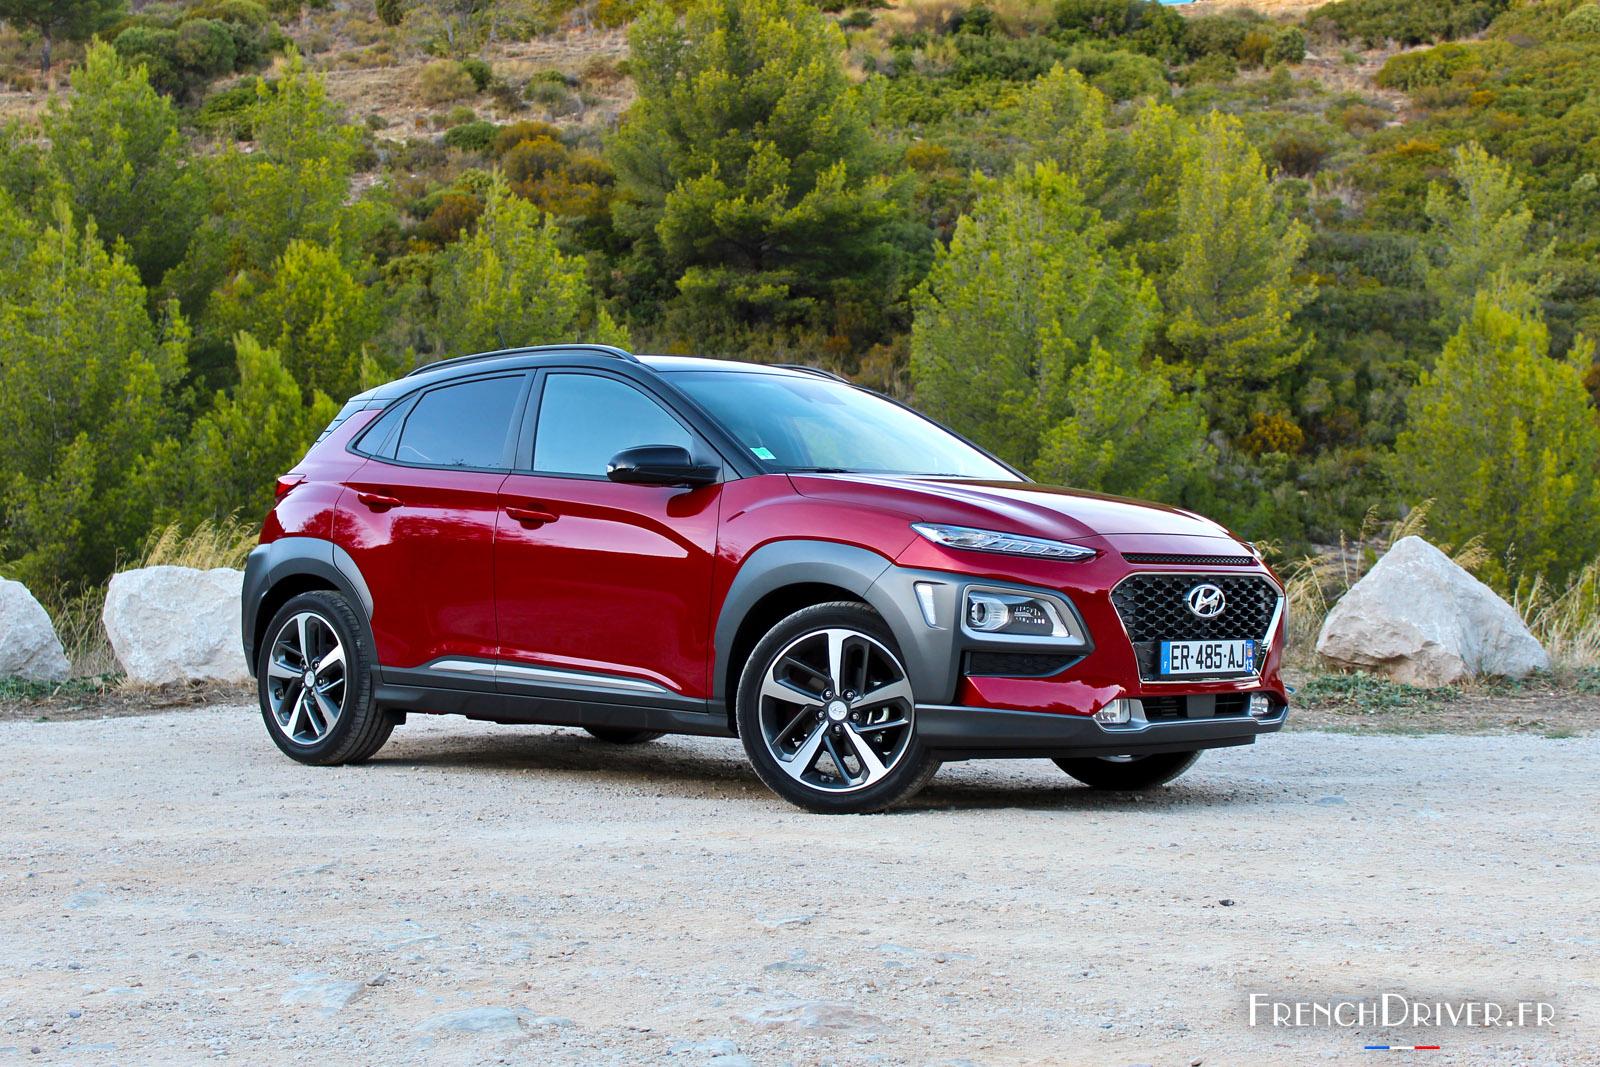 Lexus Essai Hyundai Kona Le Suv Urbain Et Audacieux French